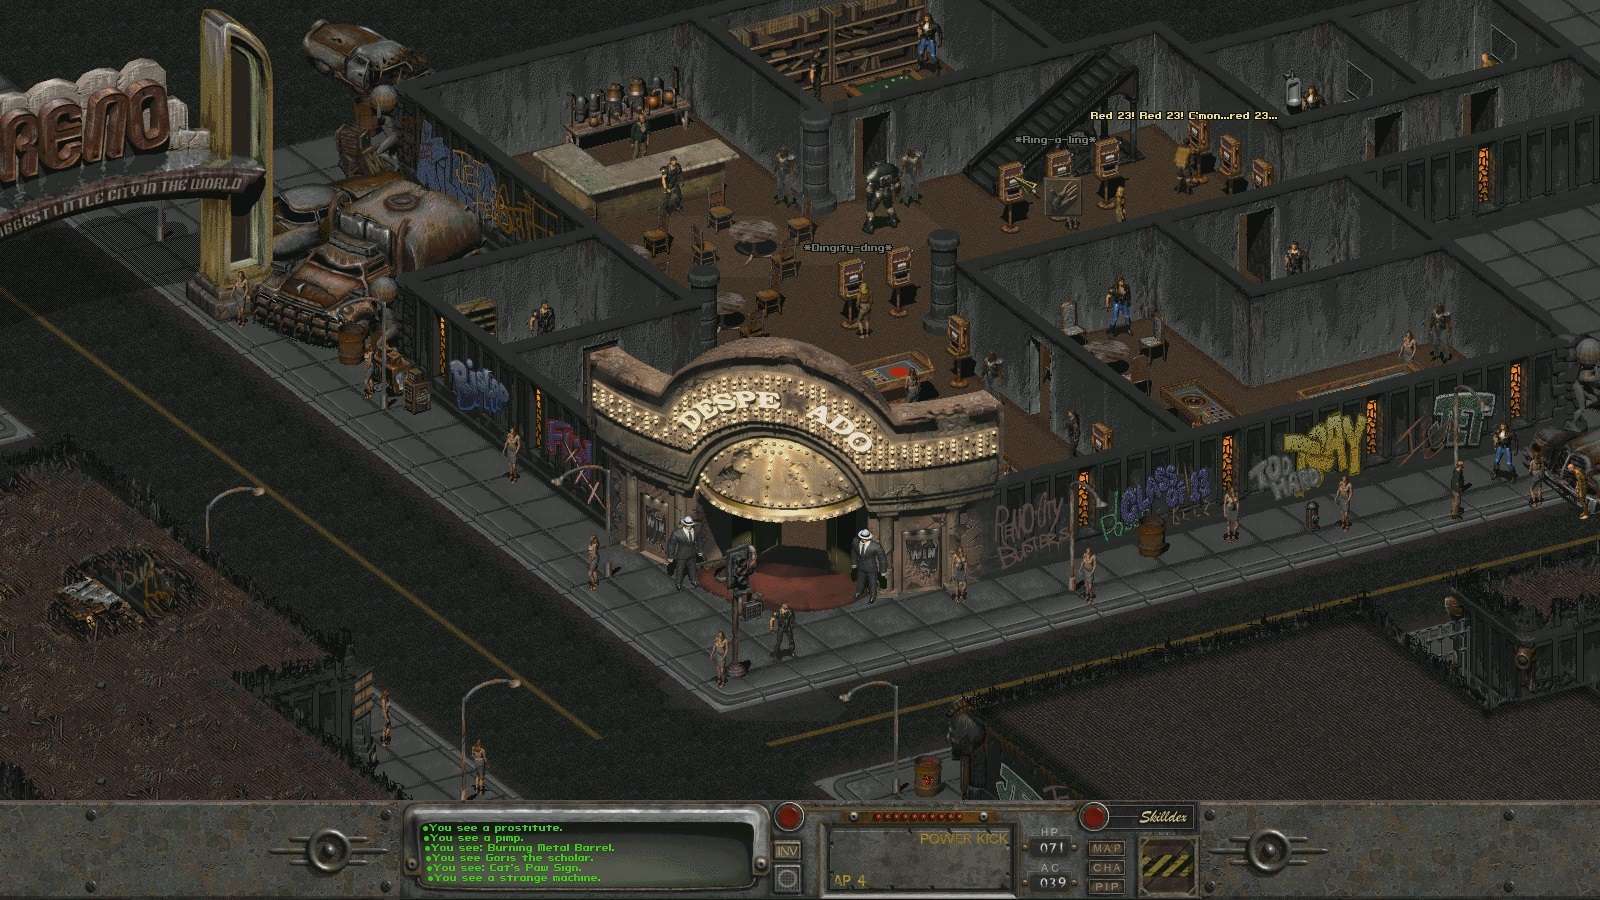 История серии игр Fallout - Раньше было лучше? Fallout 2